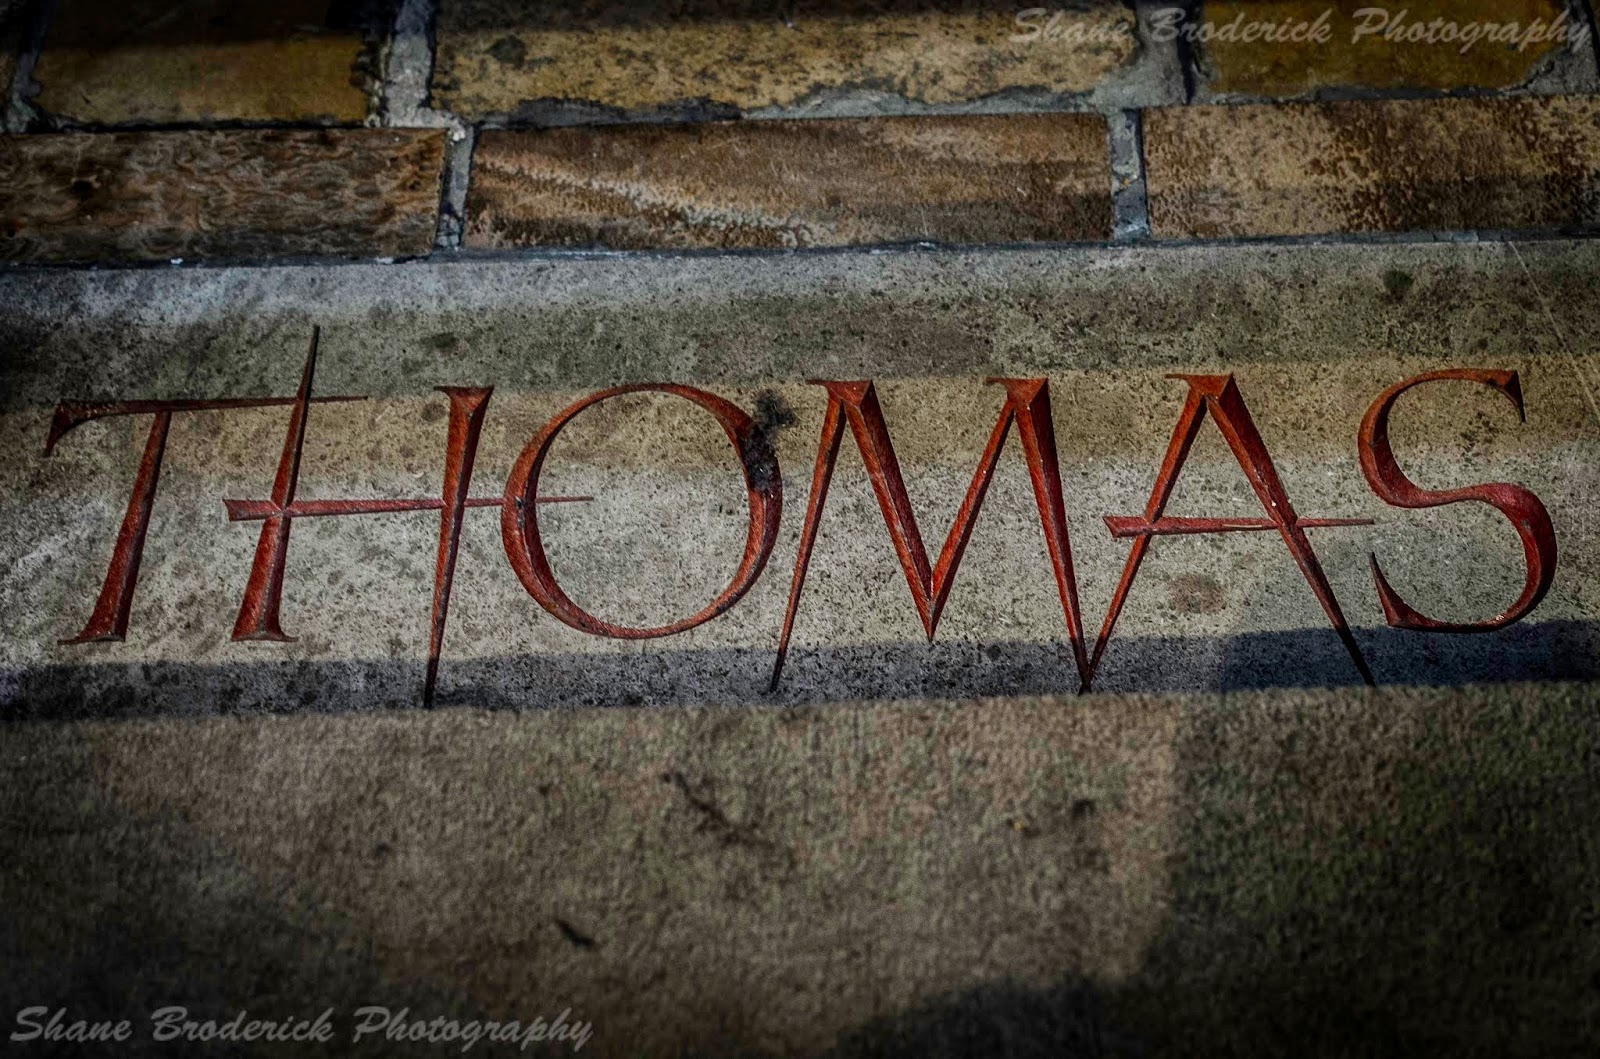 thomas becket essay english historical fiction authors the murder  english historical fiction authors the murder of thomas becket english historical fiction authors good essay